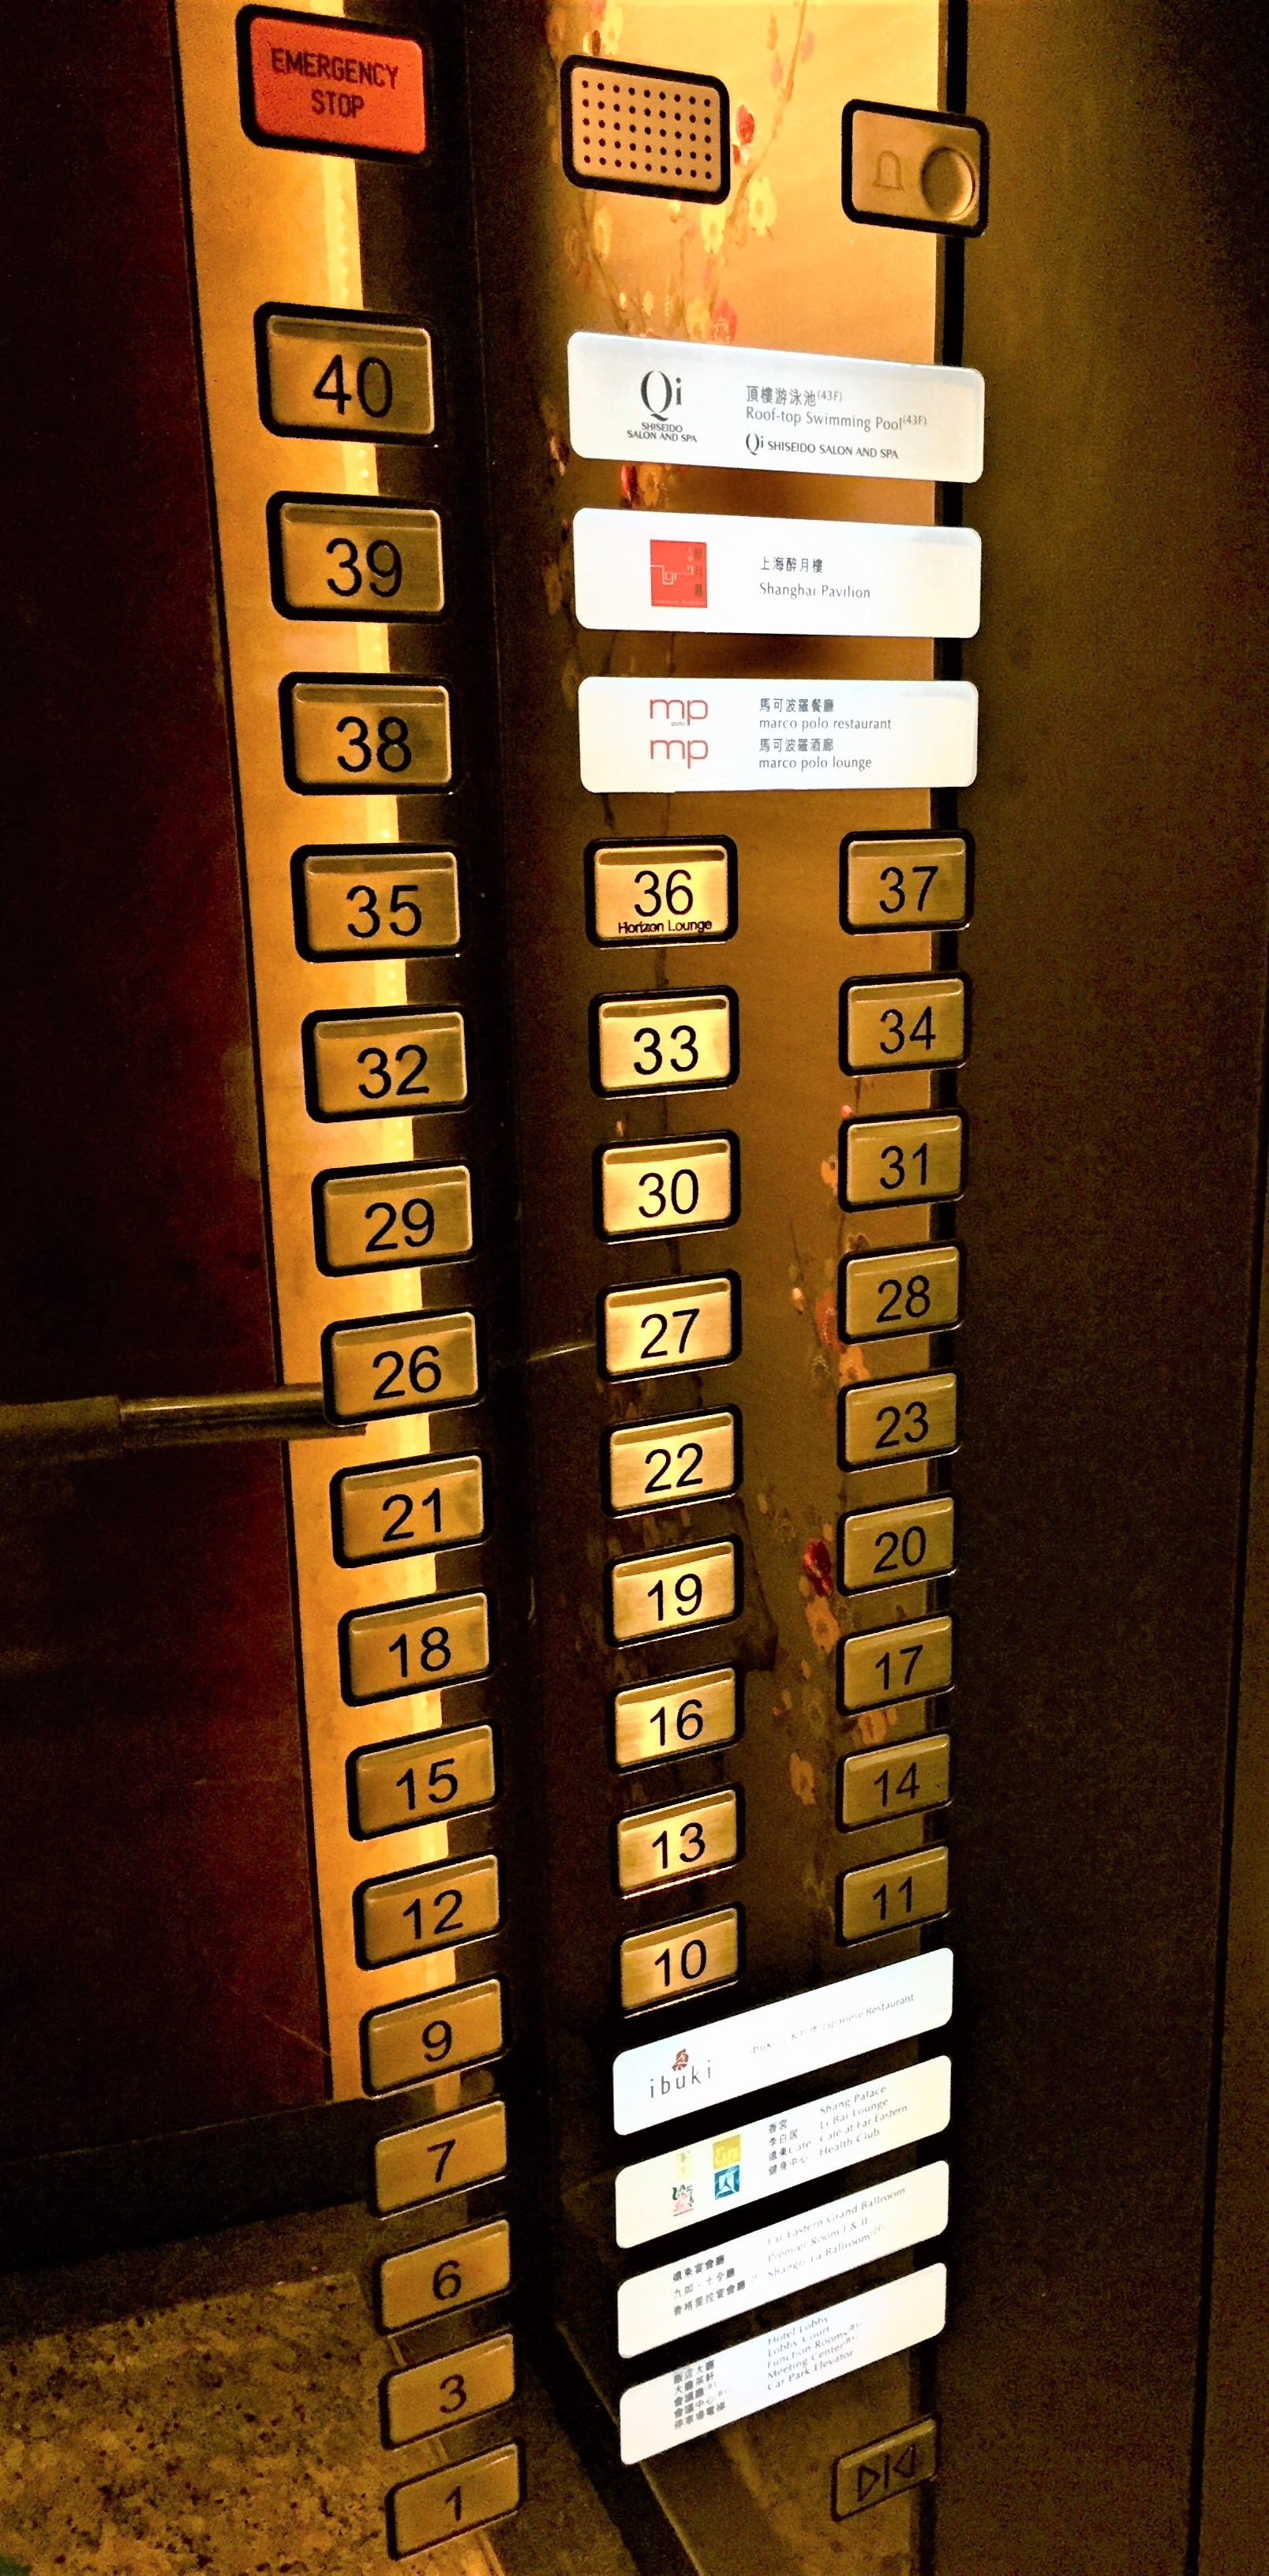 Shangri-La Taipeh, 40 Stockwerke, Aufzug